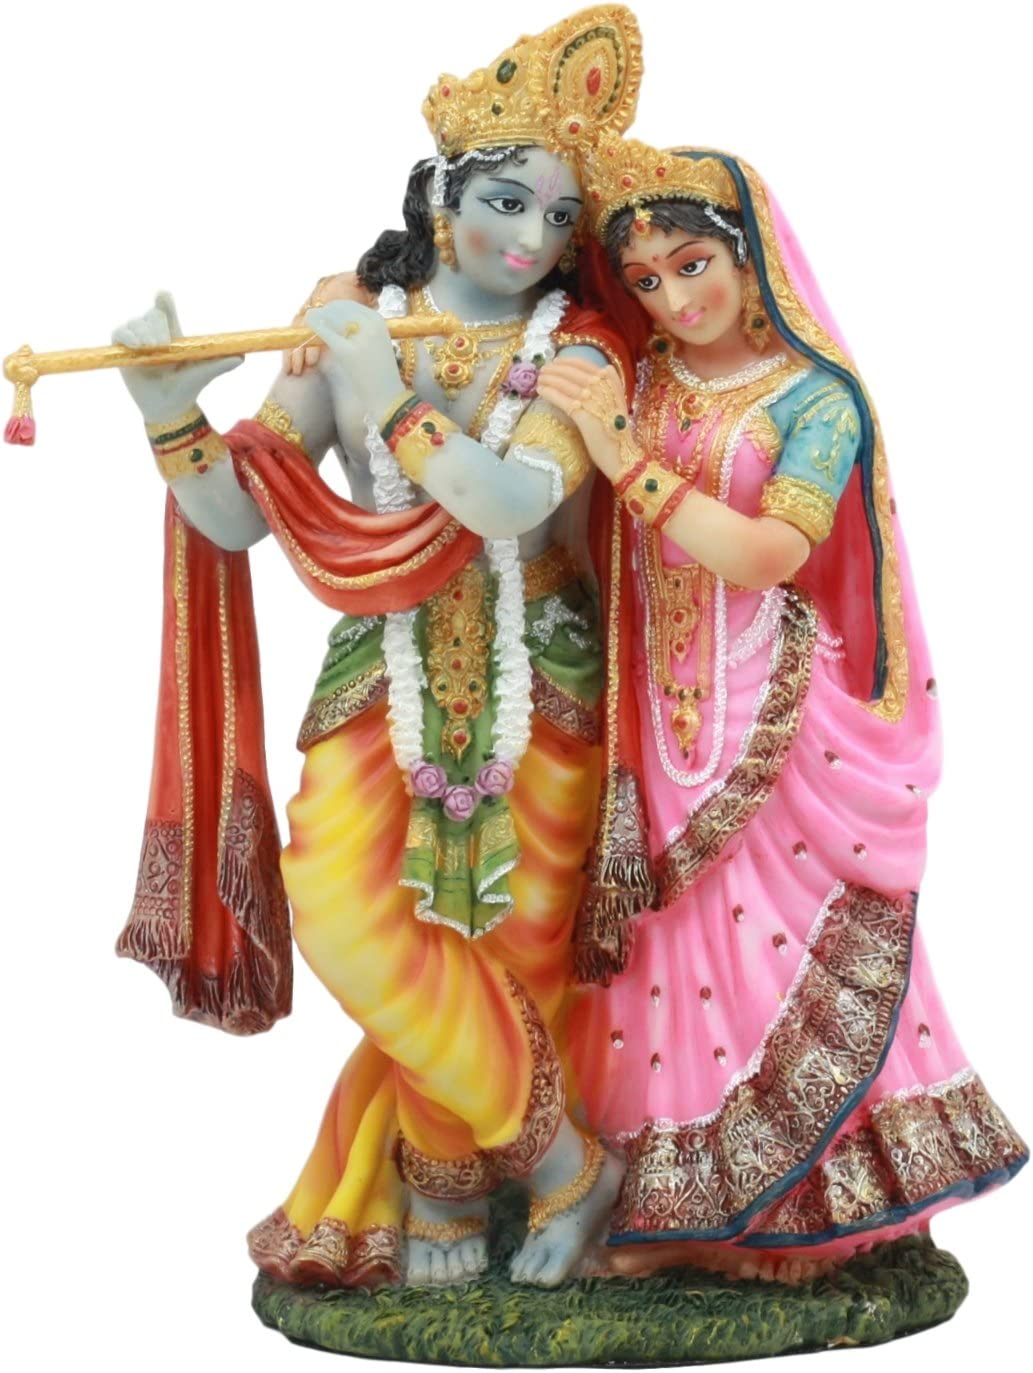 Ebros Vedic Radha Very popular and Krishna 8Tall Statue of service Avatar Vishnu